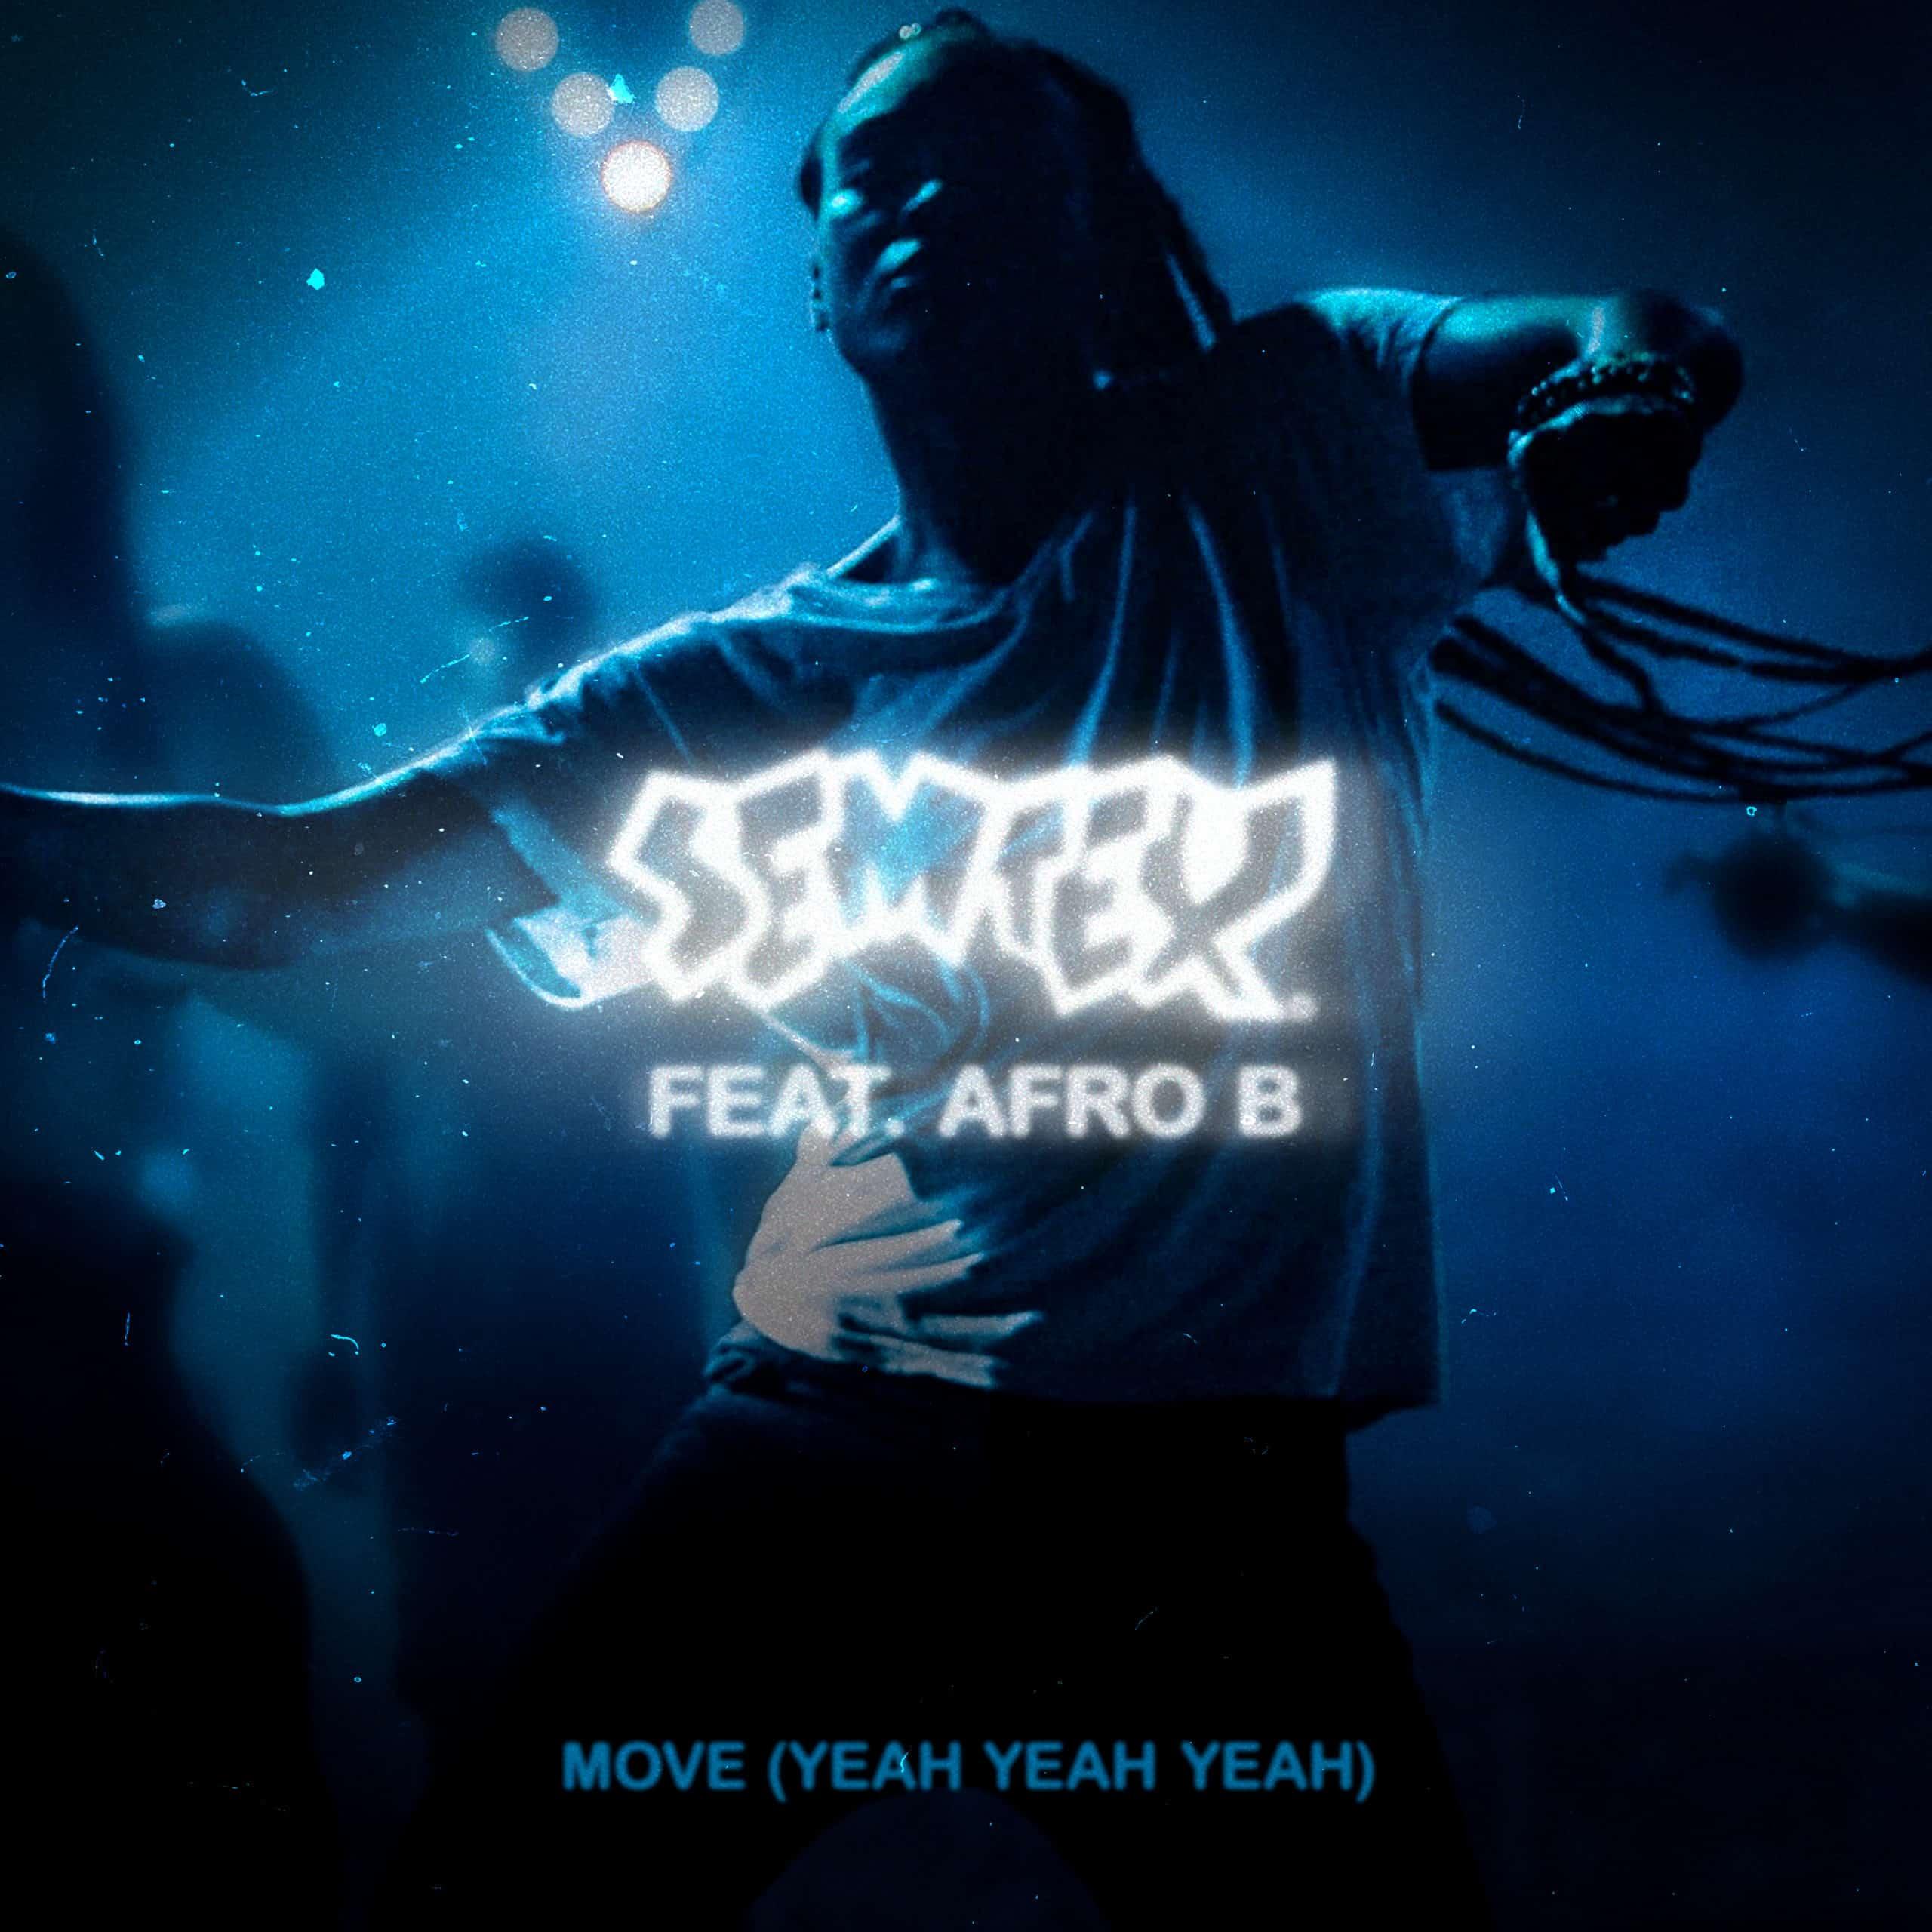 DJ Semtex - Move (Yeah Yeah Yeah) ft. Afro B - Dj Pack mp3